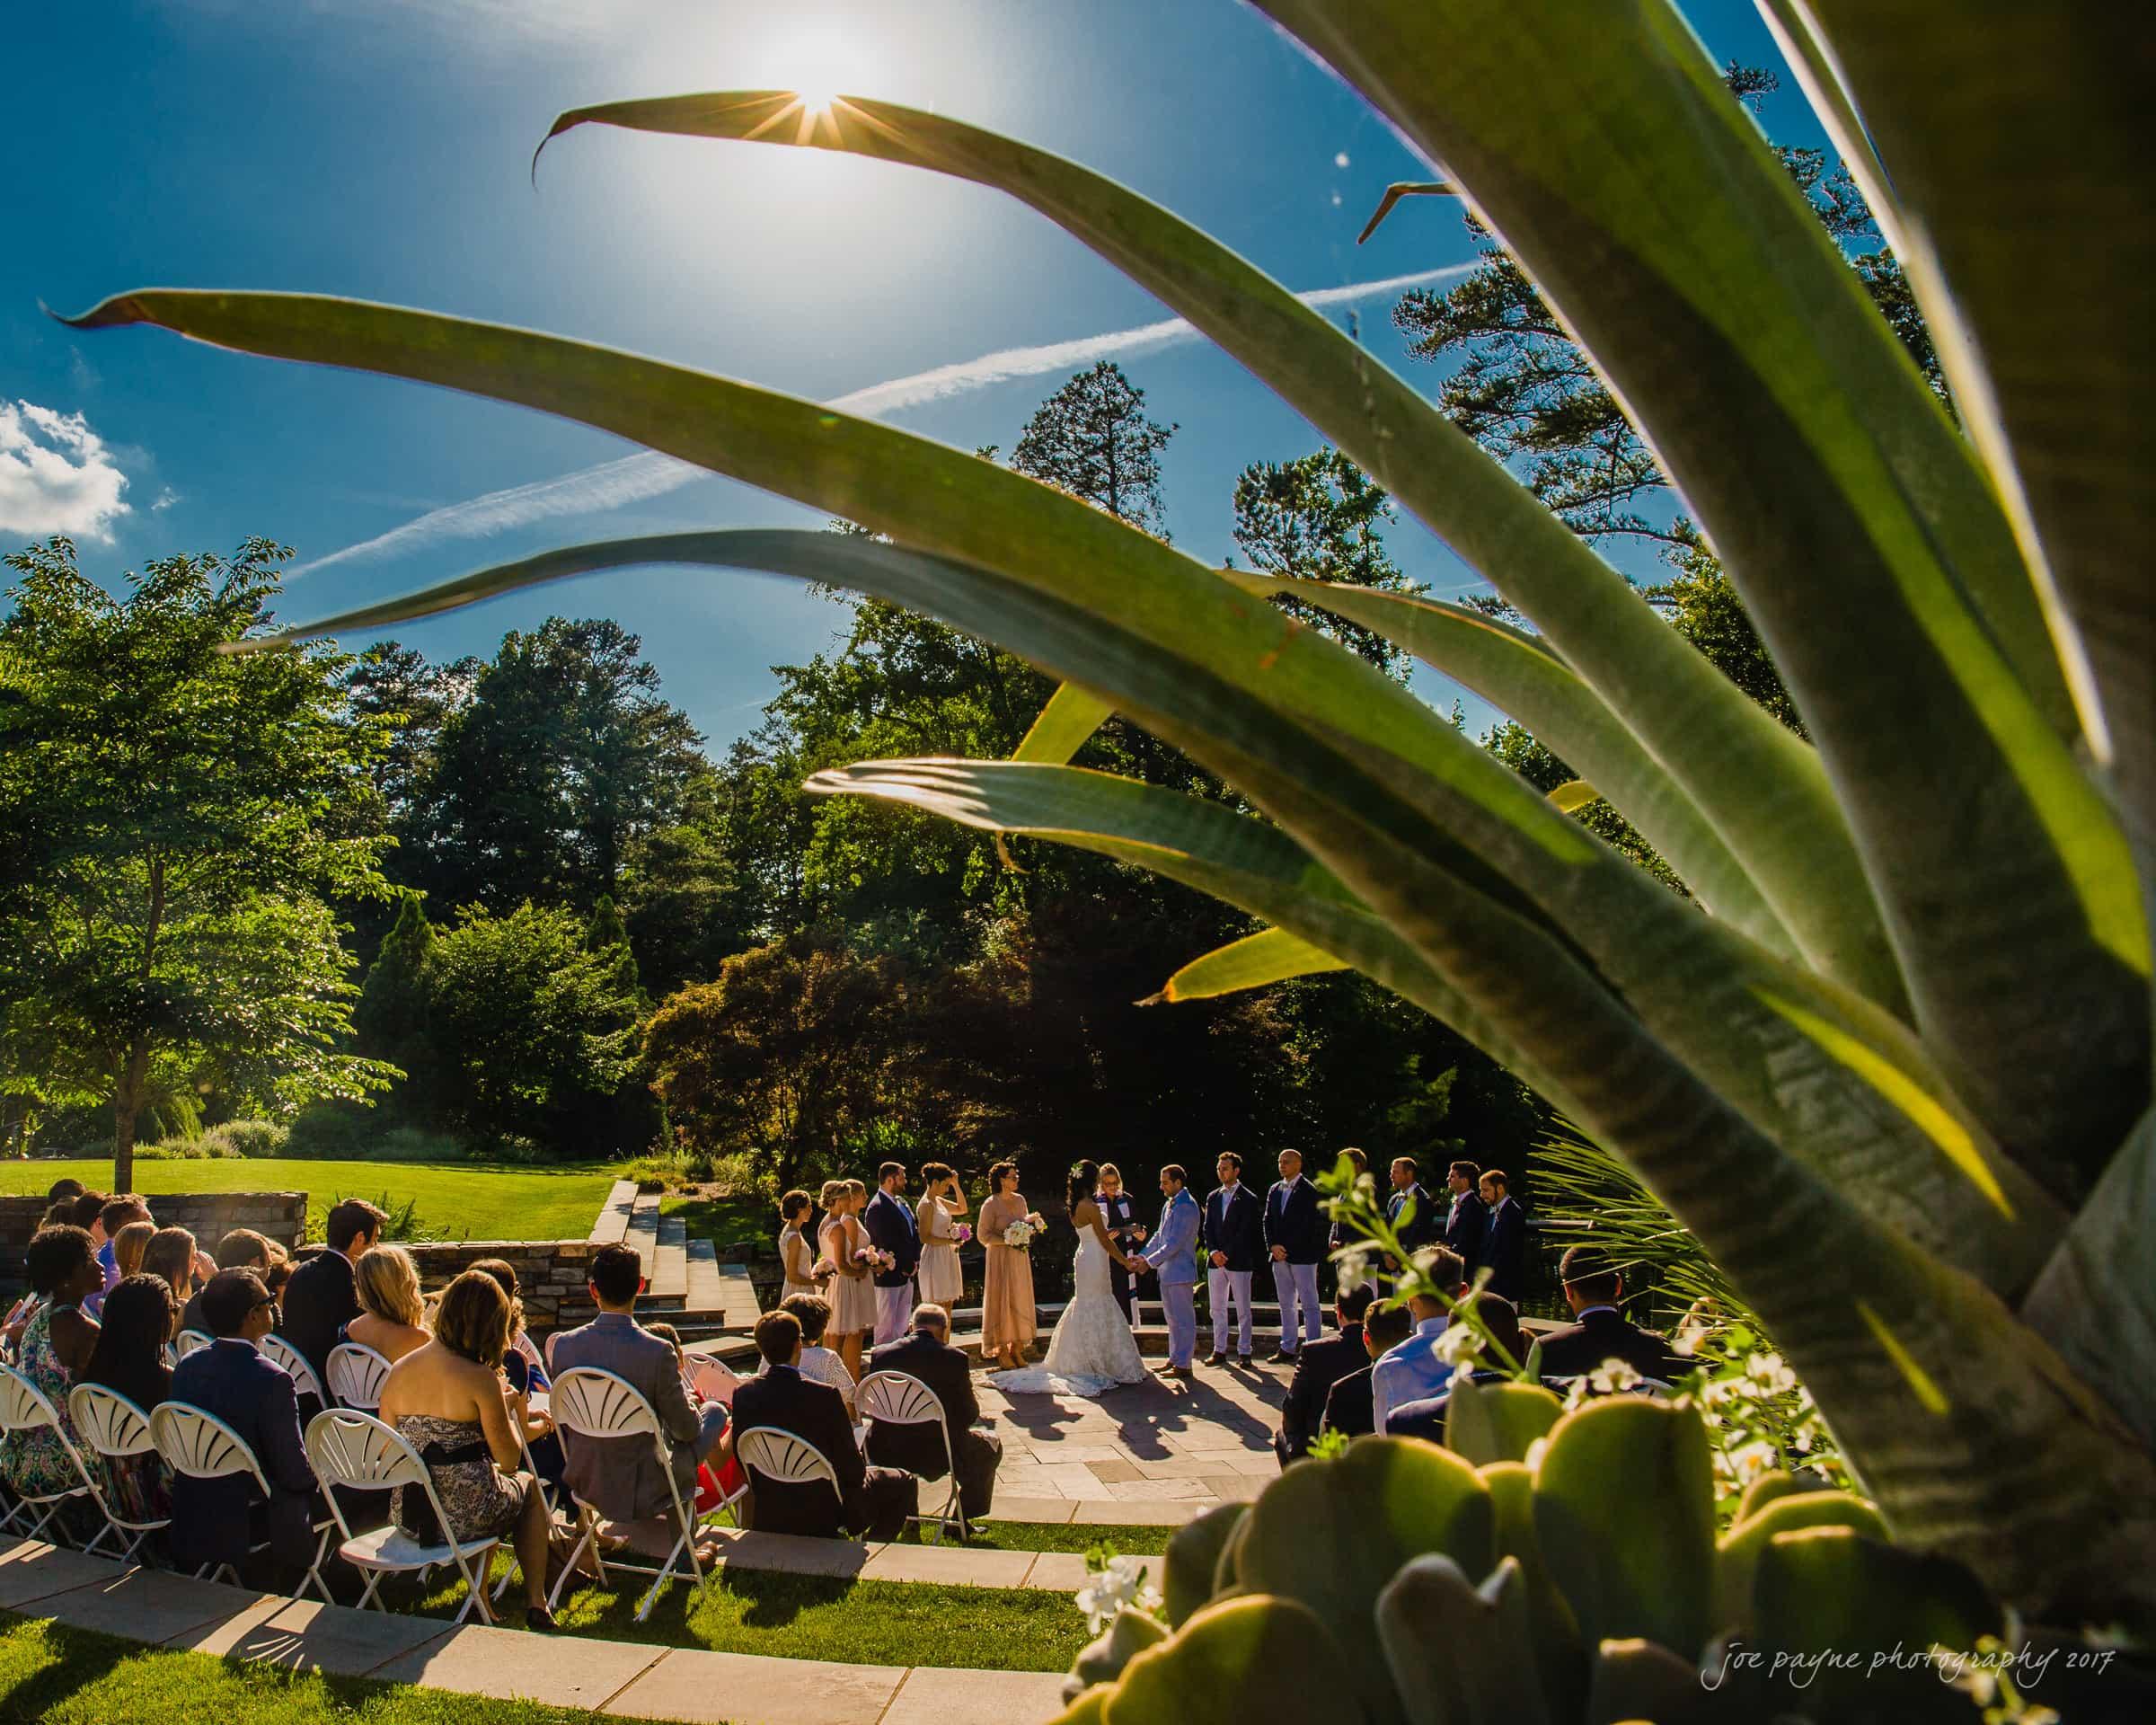 duke gardens wedding photography - joe payne photographer